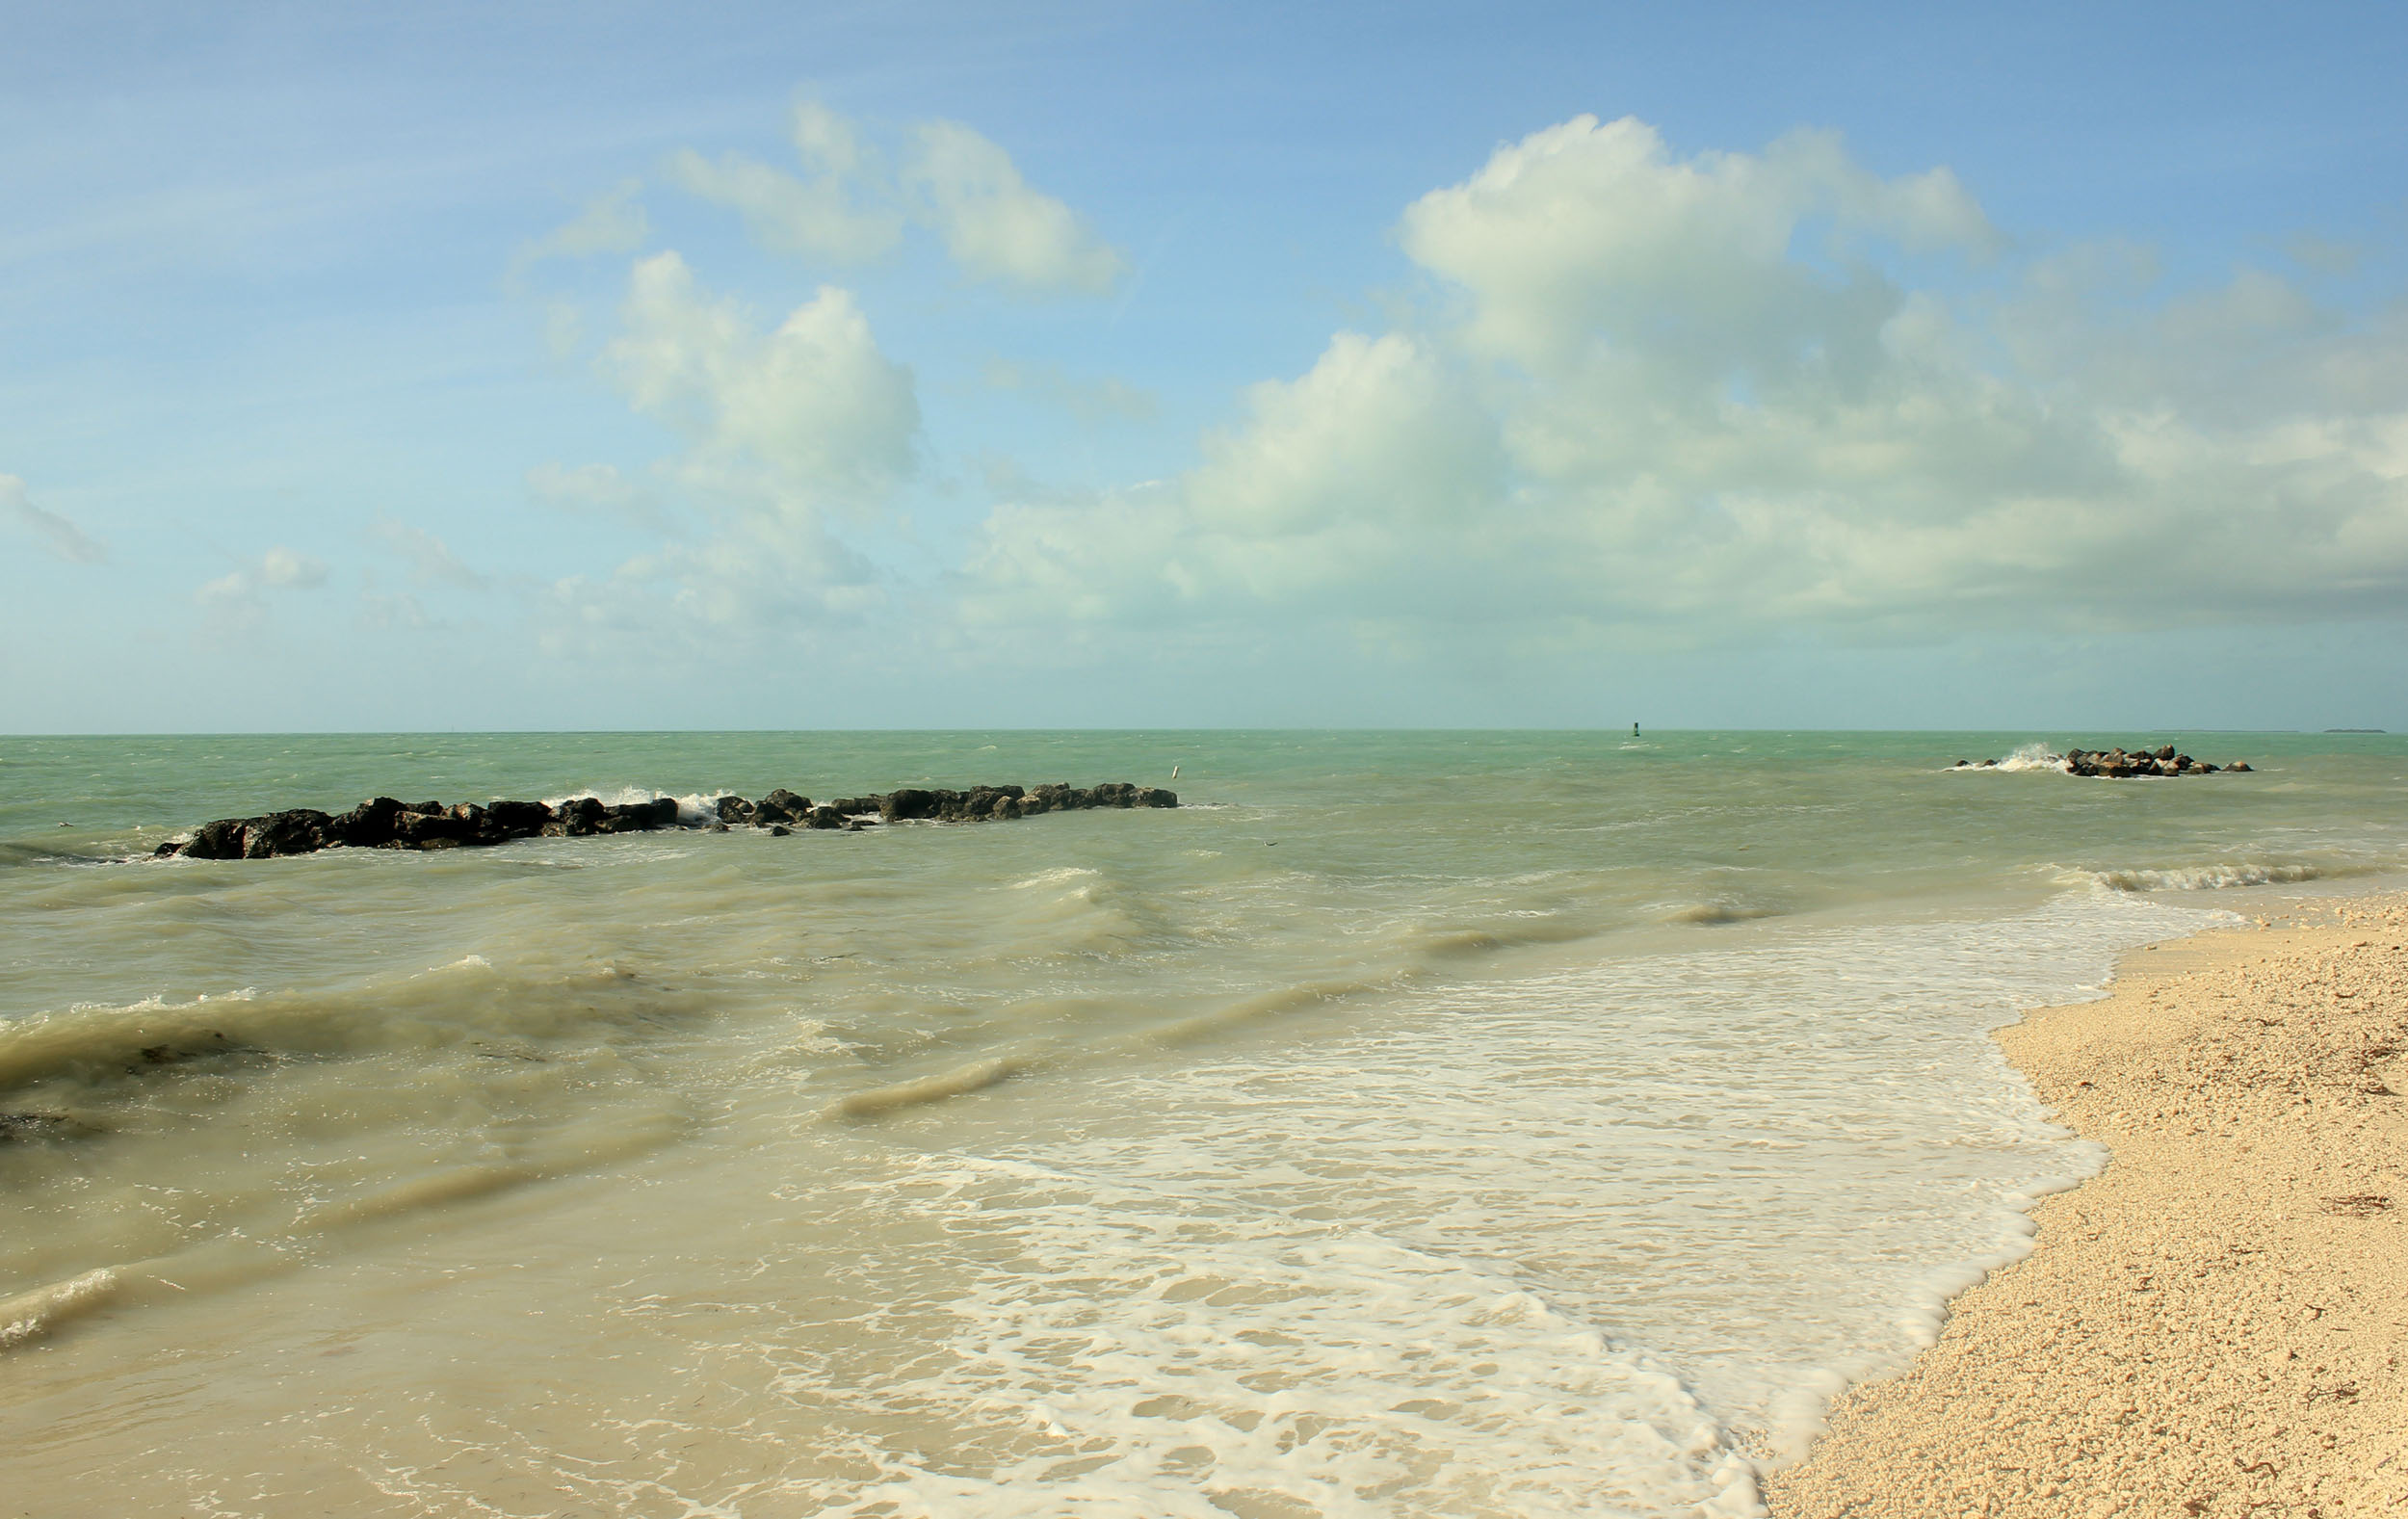 Gfp-florida-keys-key-west-waves-washing-ashore.jpg